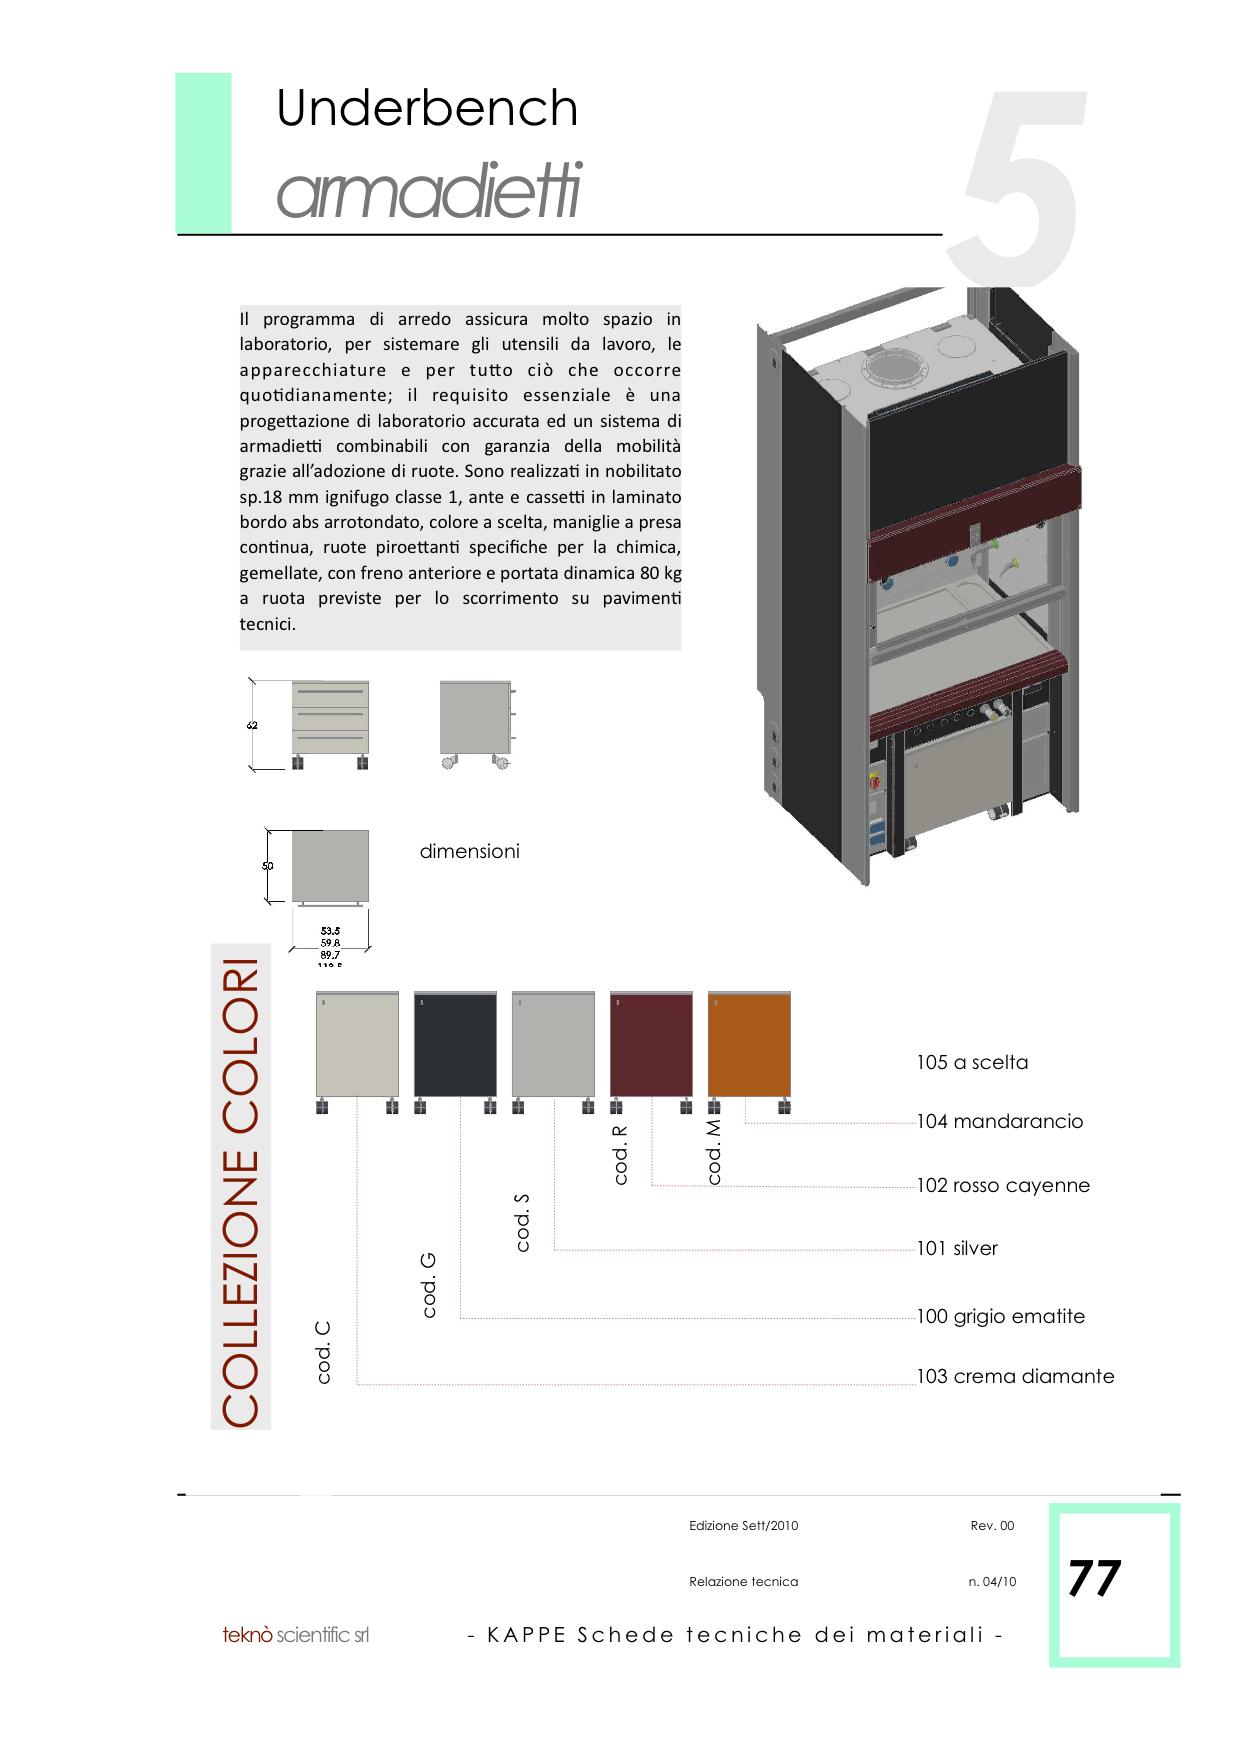 KAPPE Schede tecniche materiali copia 2.png